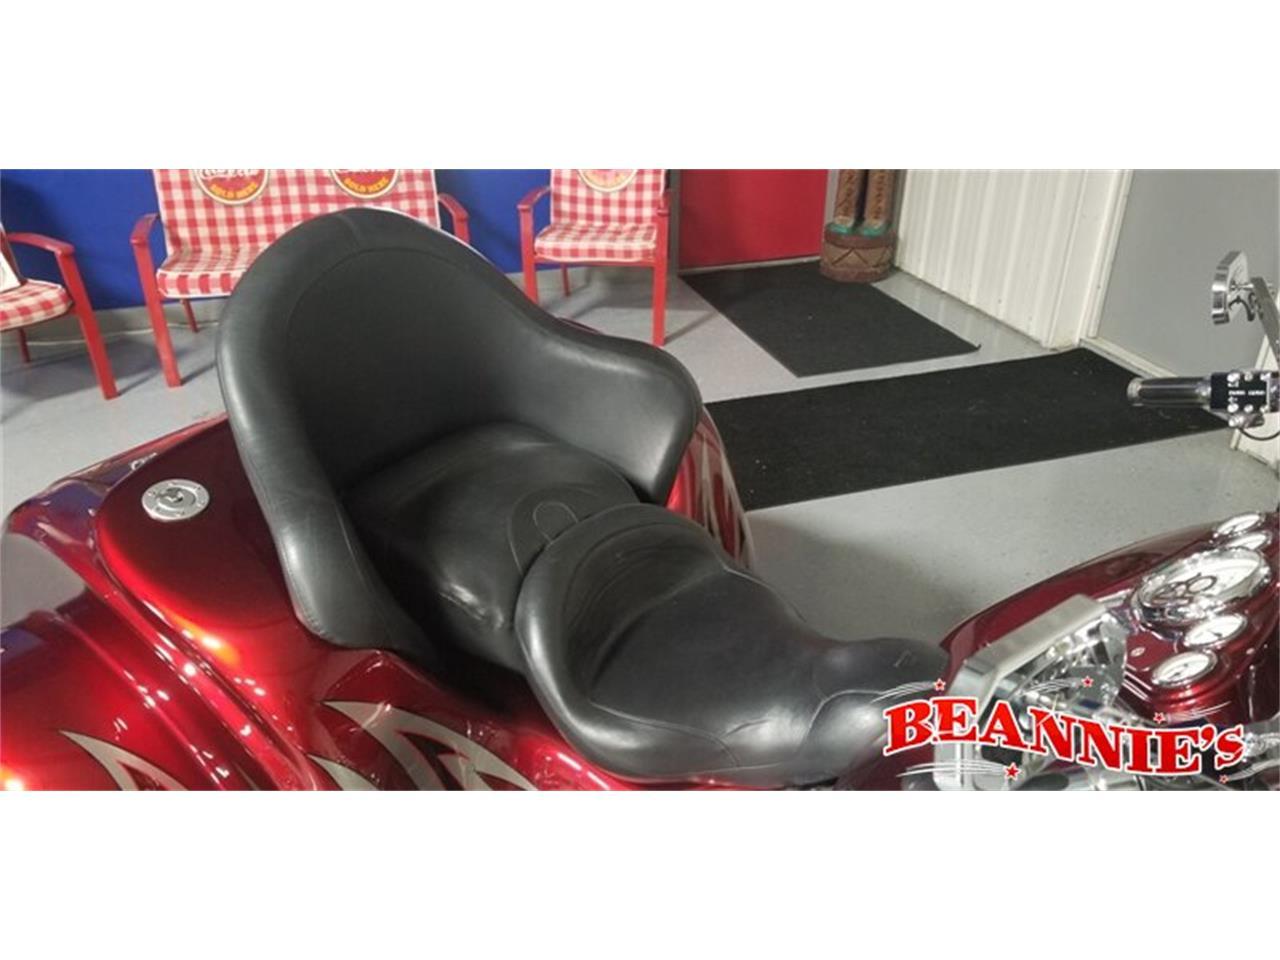 2007 Boss Hoss Motorcycle (CC-1265047) for sale in Daytona Beach, Florida